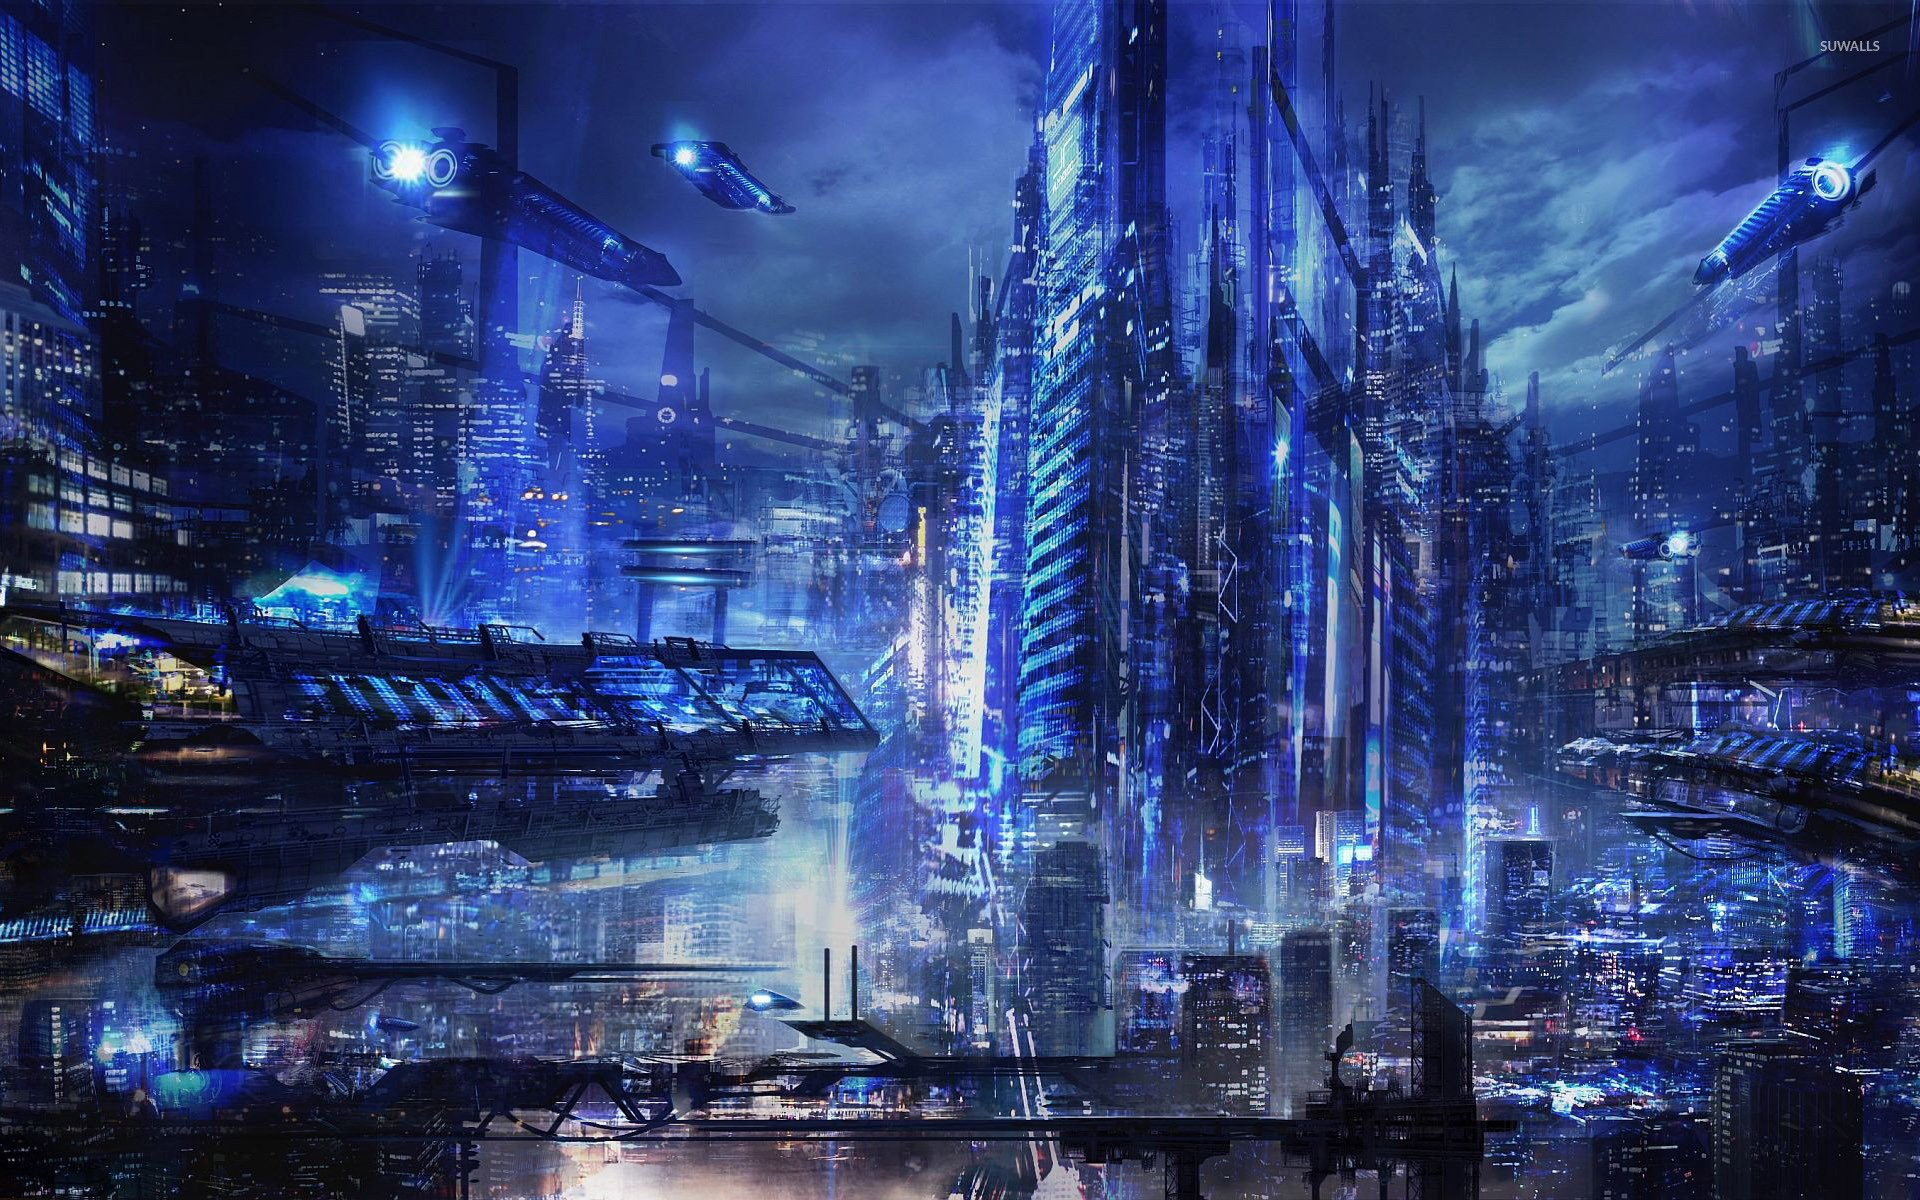 Cyberpunk city wallpaper   Fantasy wallpapers   30036 1920x1200